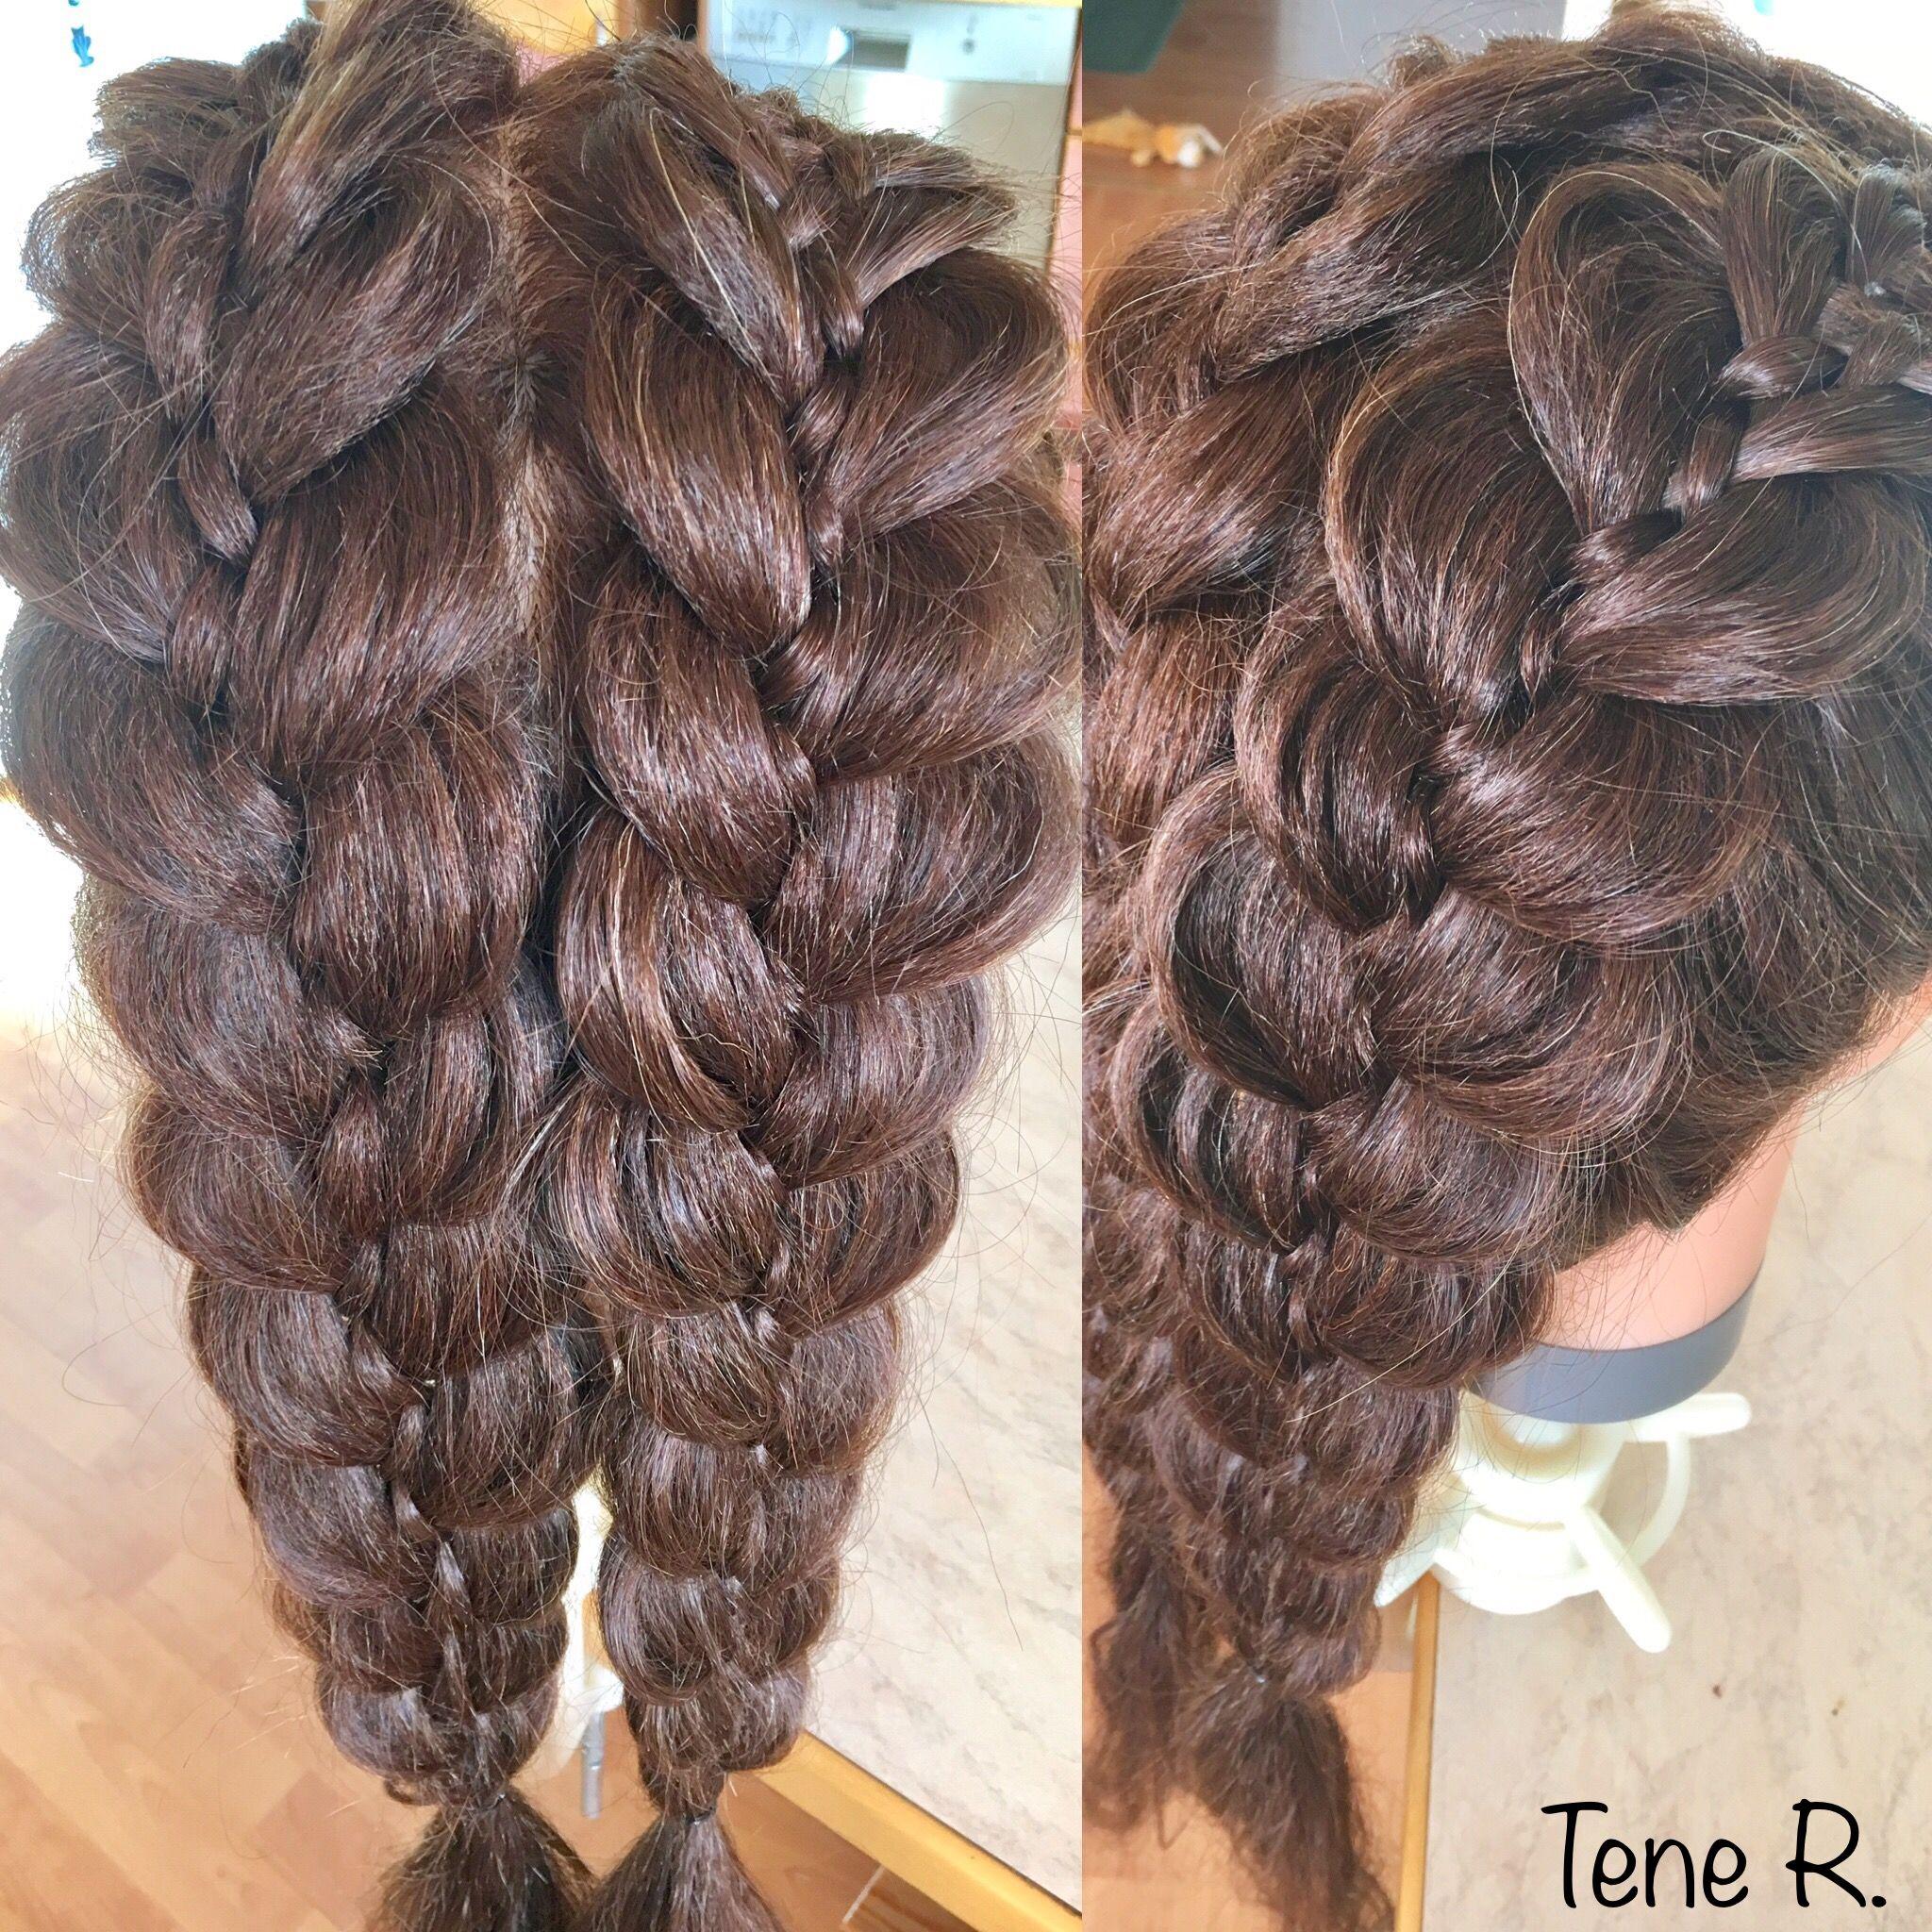 strand braid  Hair  Pinterest  Natural hair braids